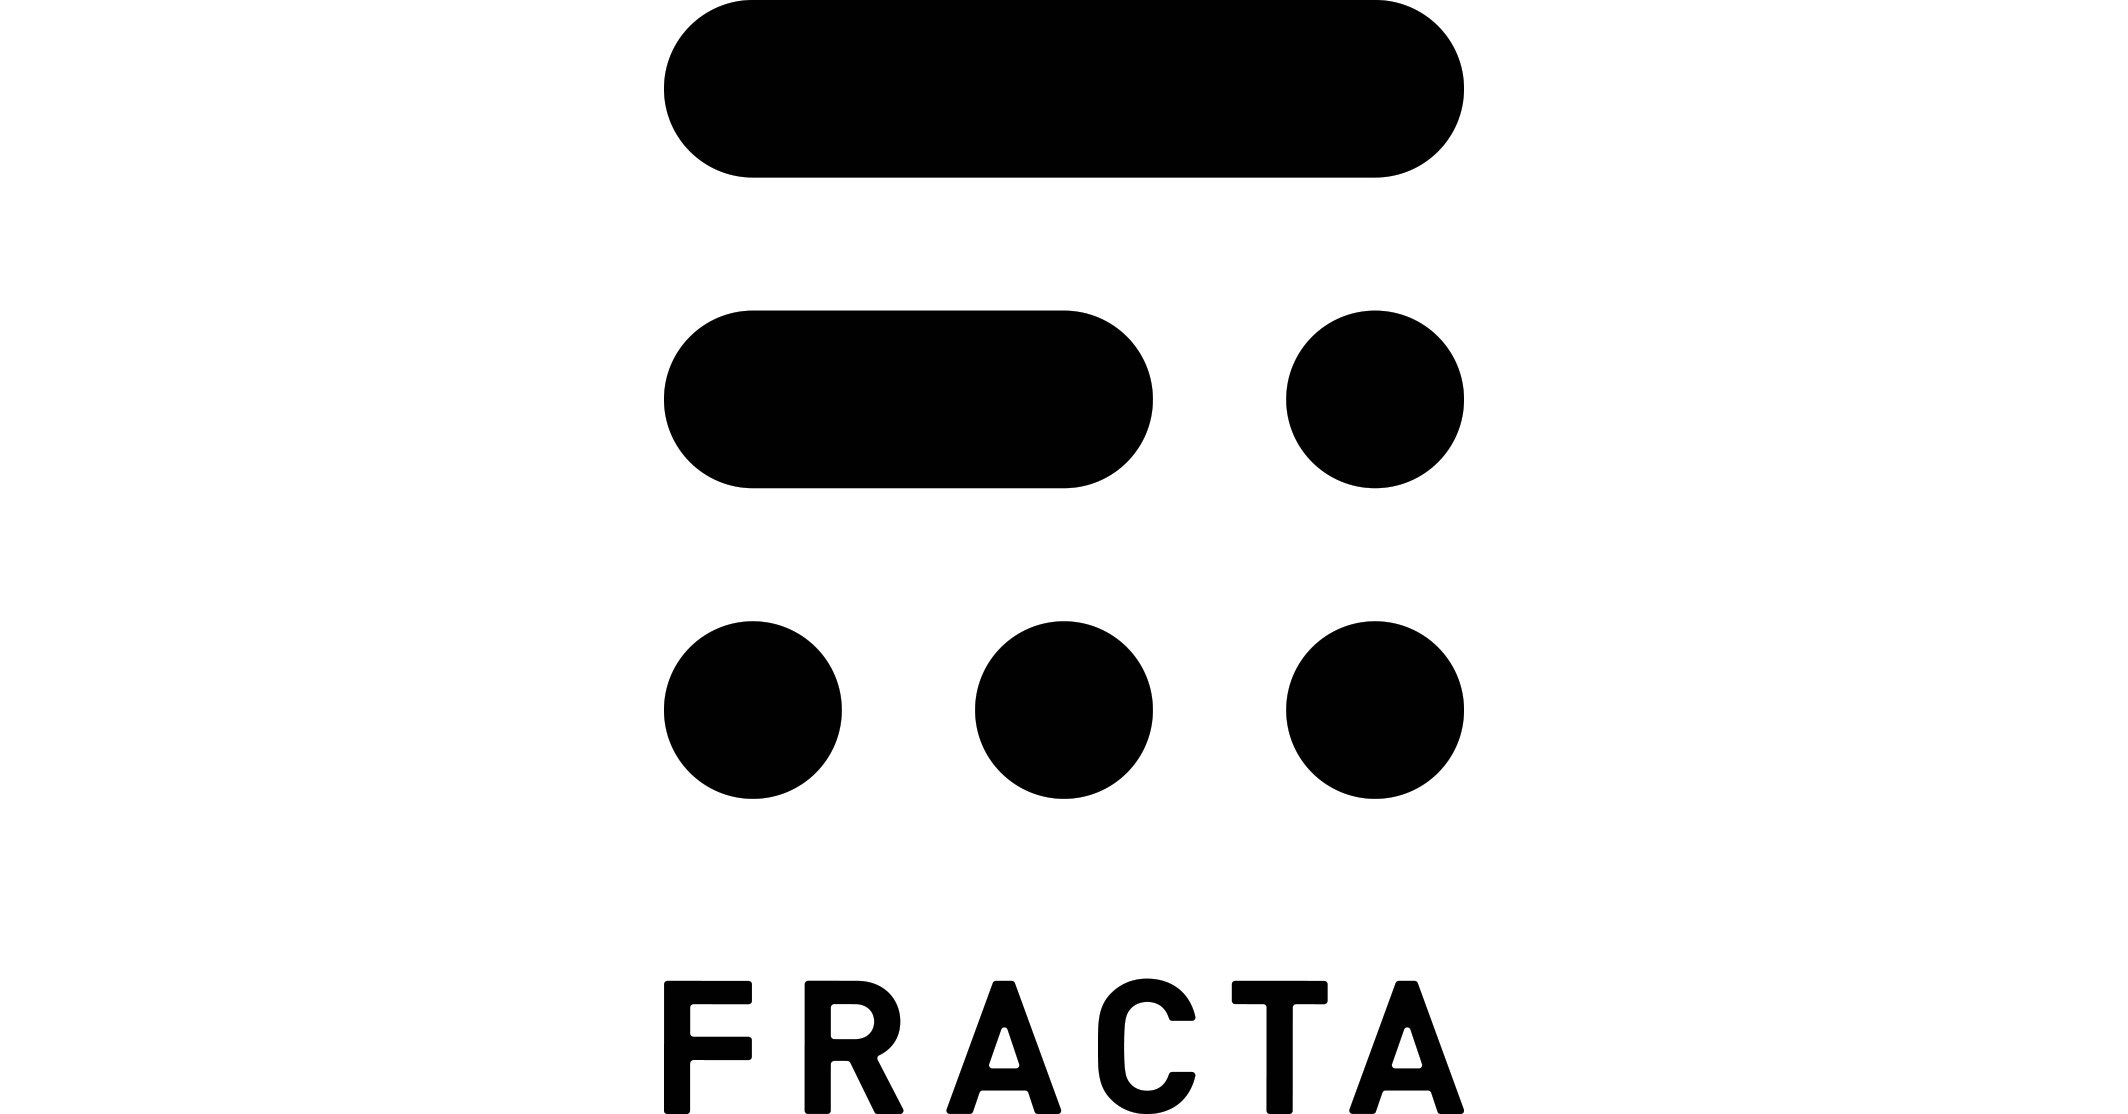 Fracta logo